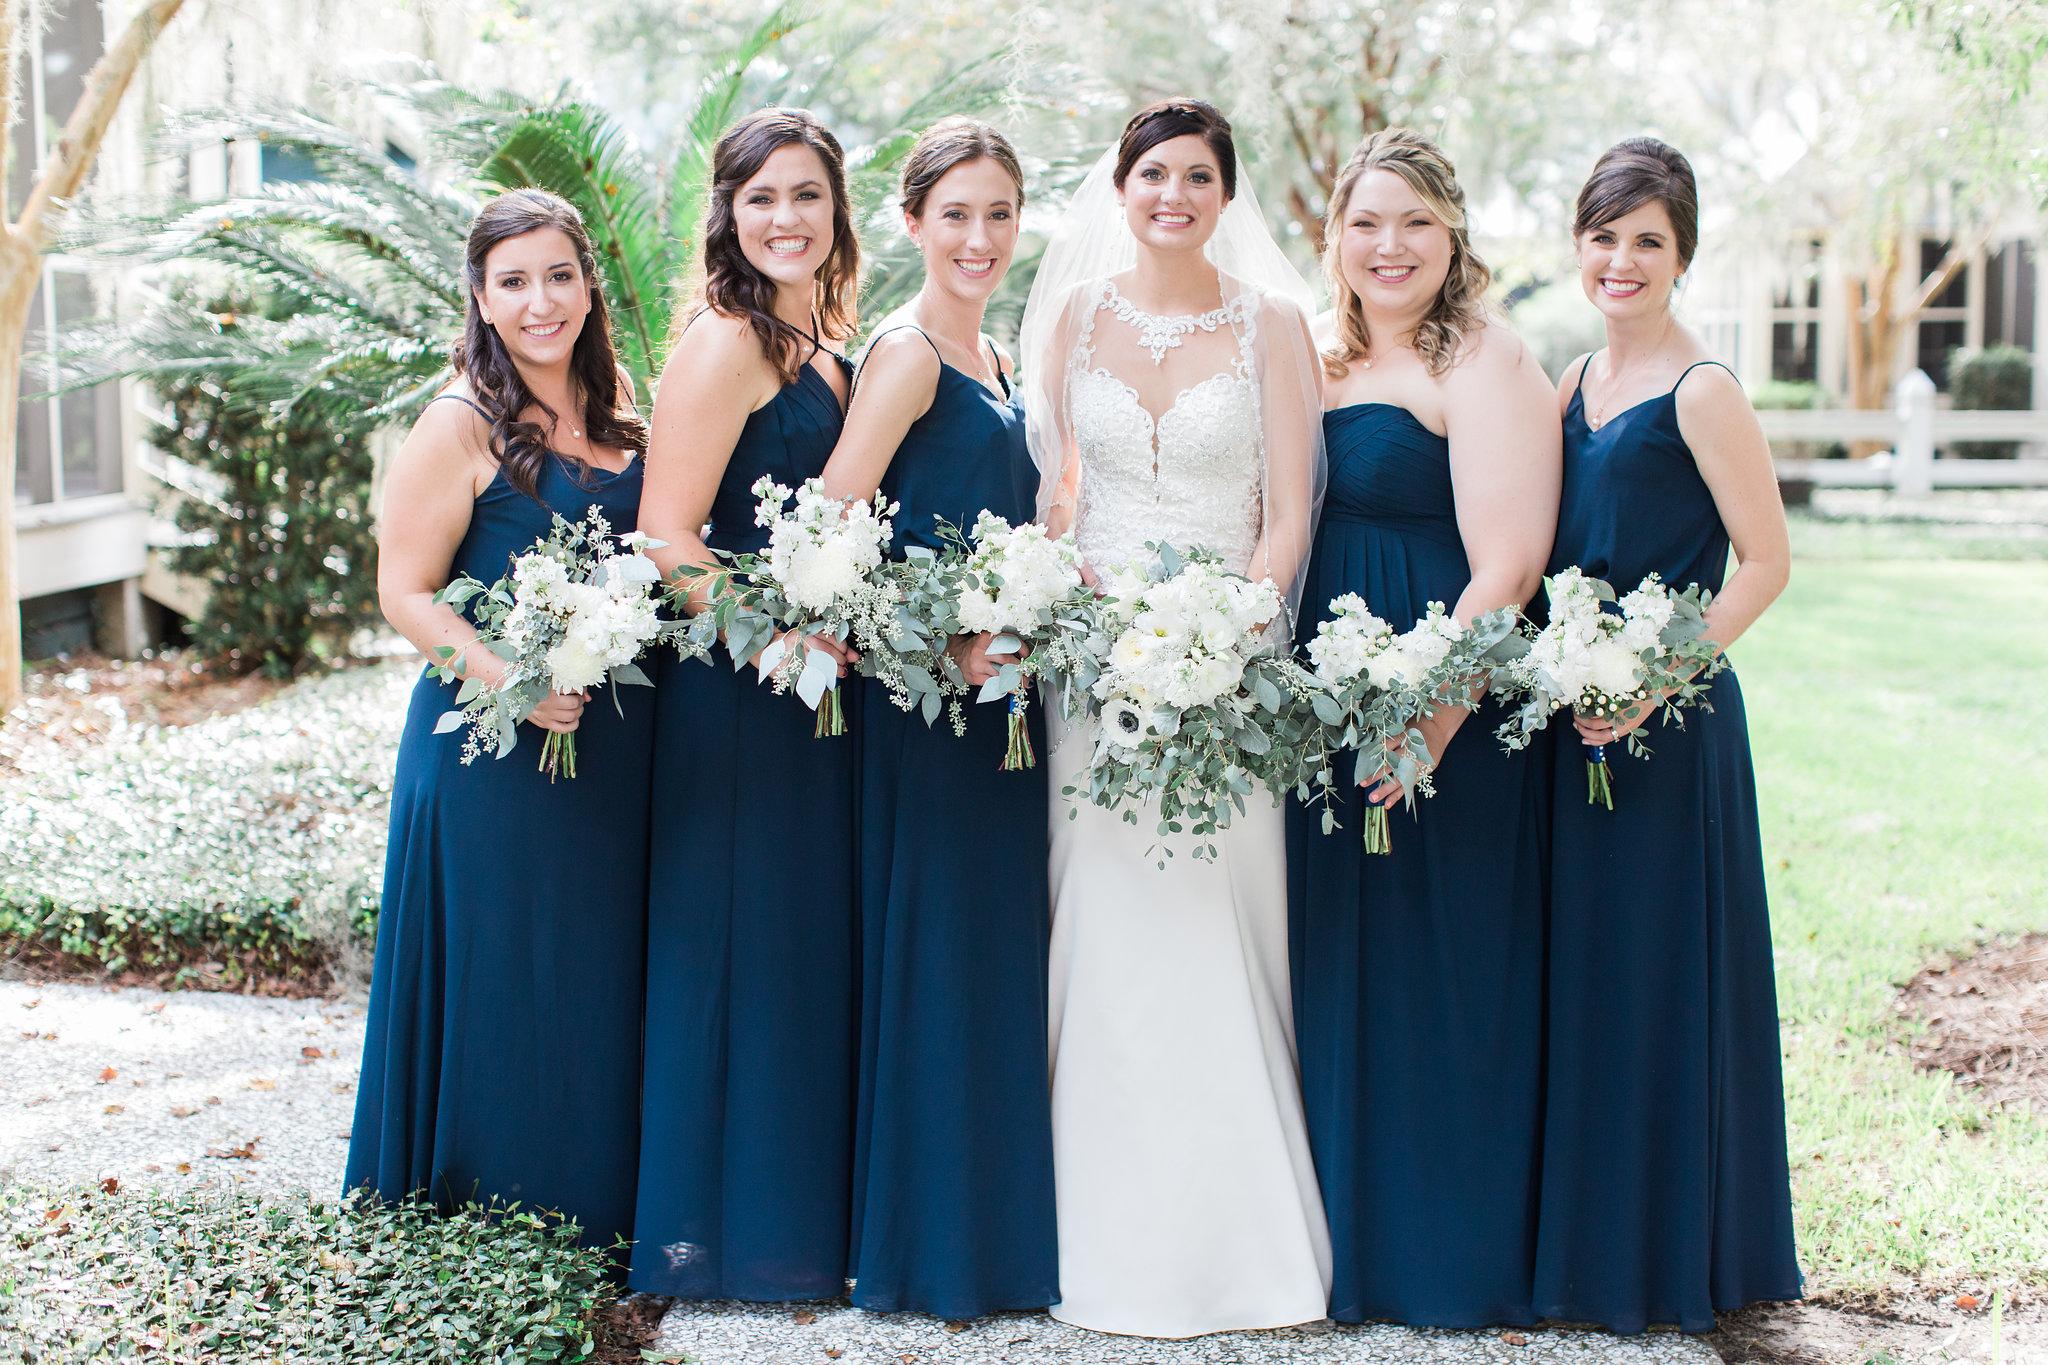 apt-b-photography-lauren-graham-oldfield-wedding-south-carolina-wedding-photographer-savannah-wedding-lowcountry-wedding-coastal-wedding-navy-bridesmaids-19.JPG